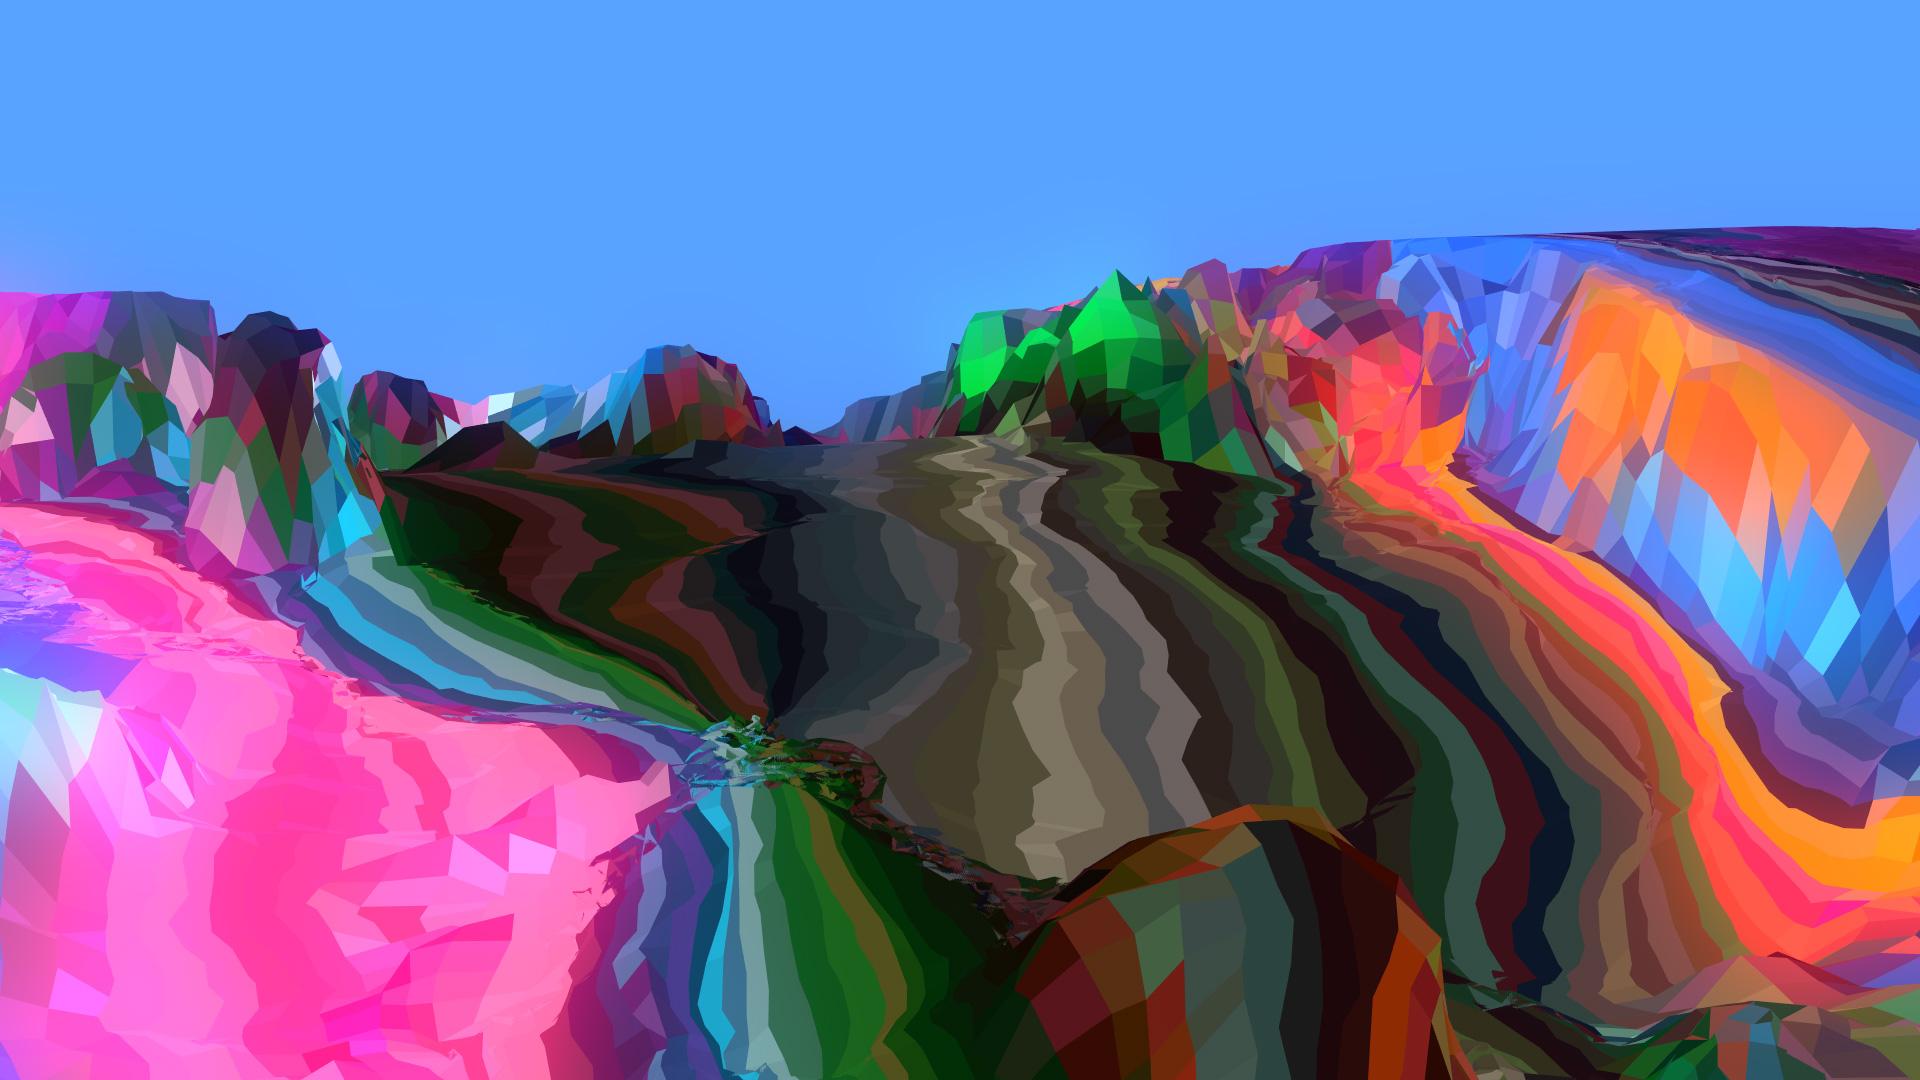 magic-mountain-(0-00-15-09)_2.jpg